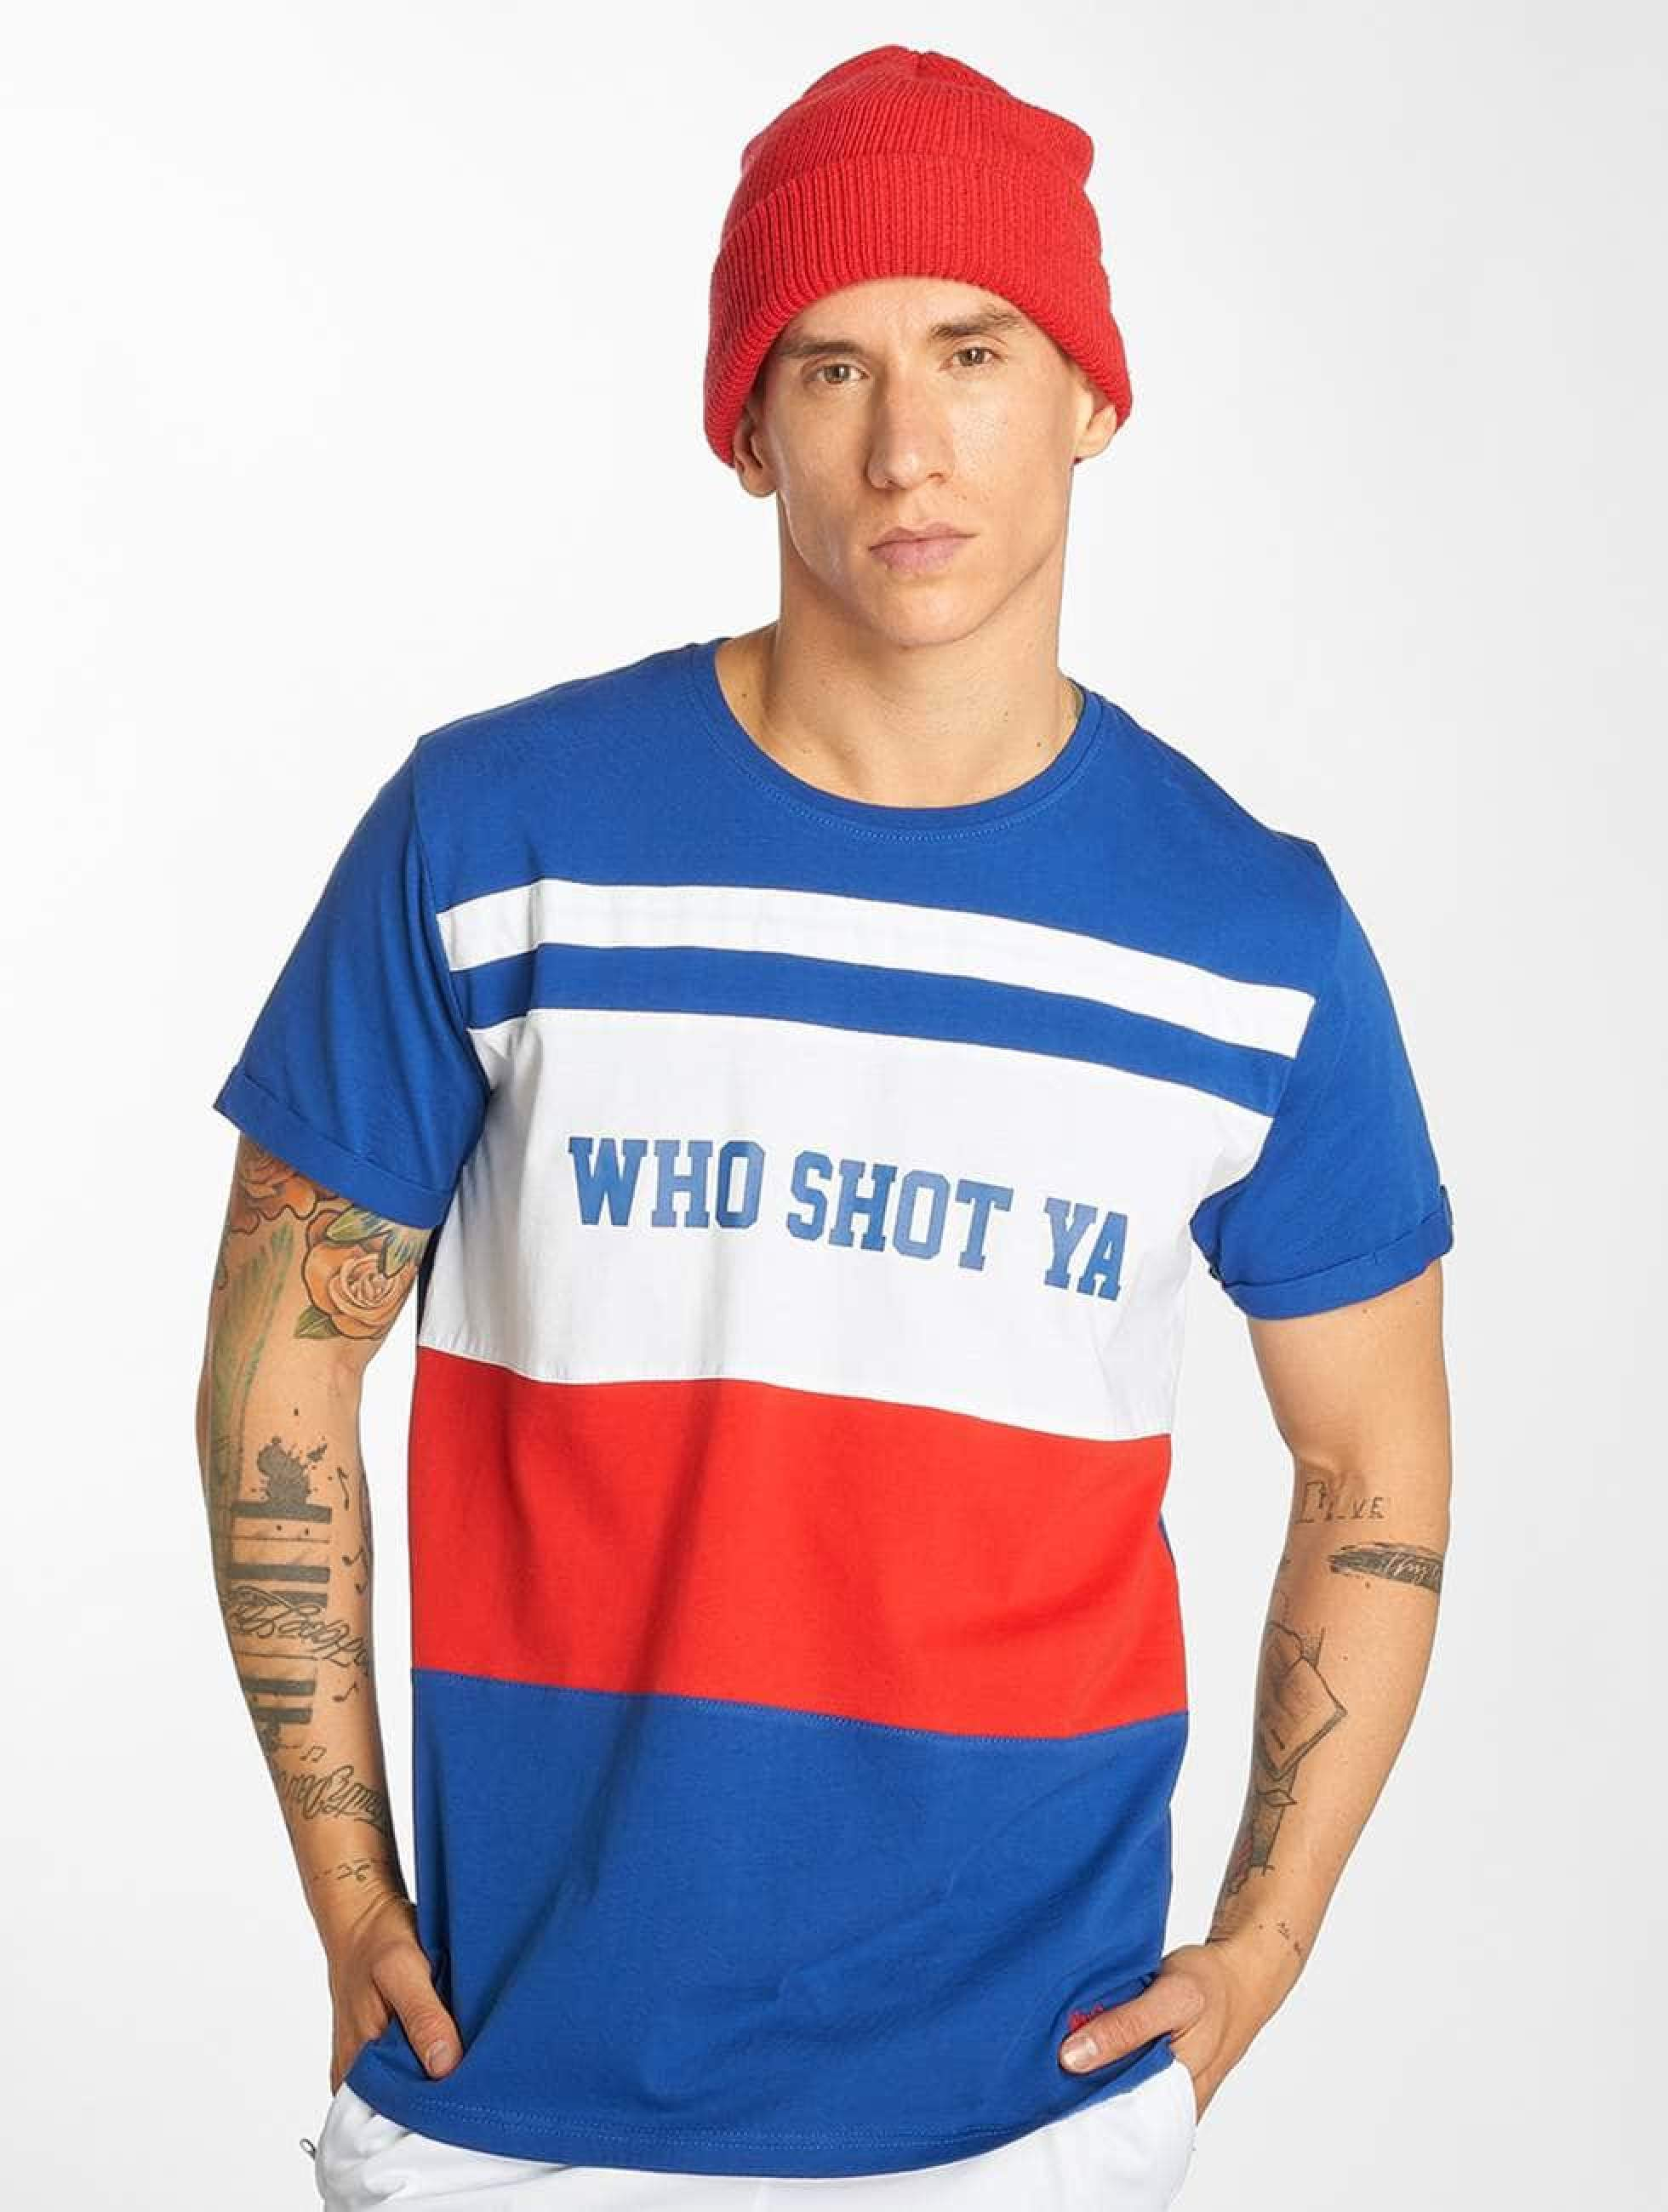 Who Shot Ya? / T-Shirt PortMorris in blue XL